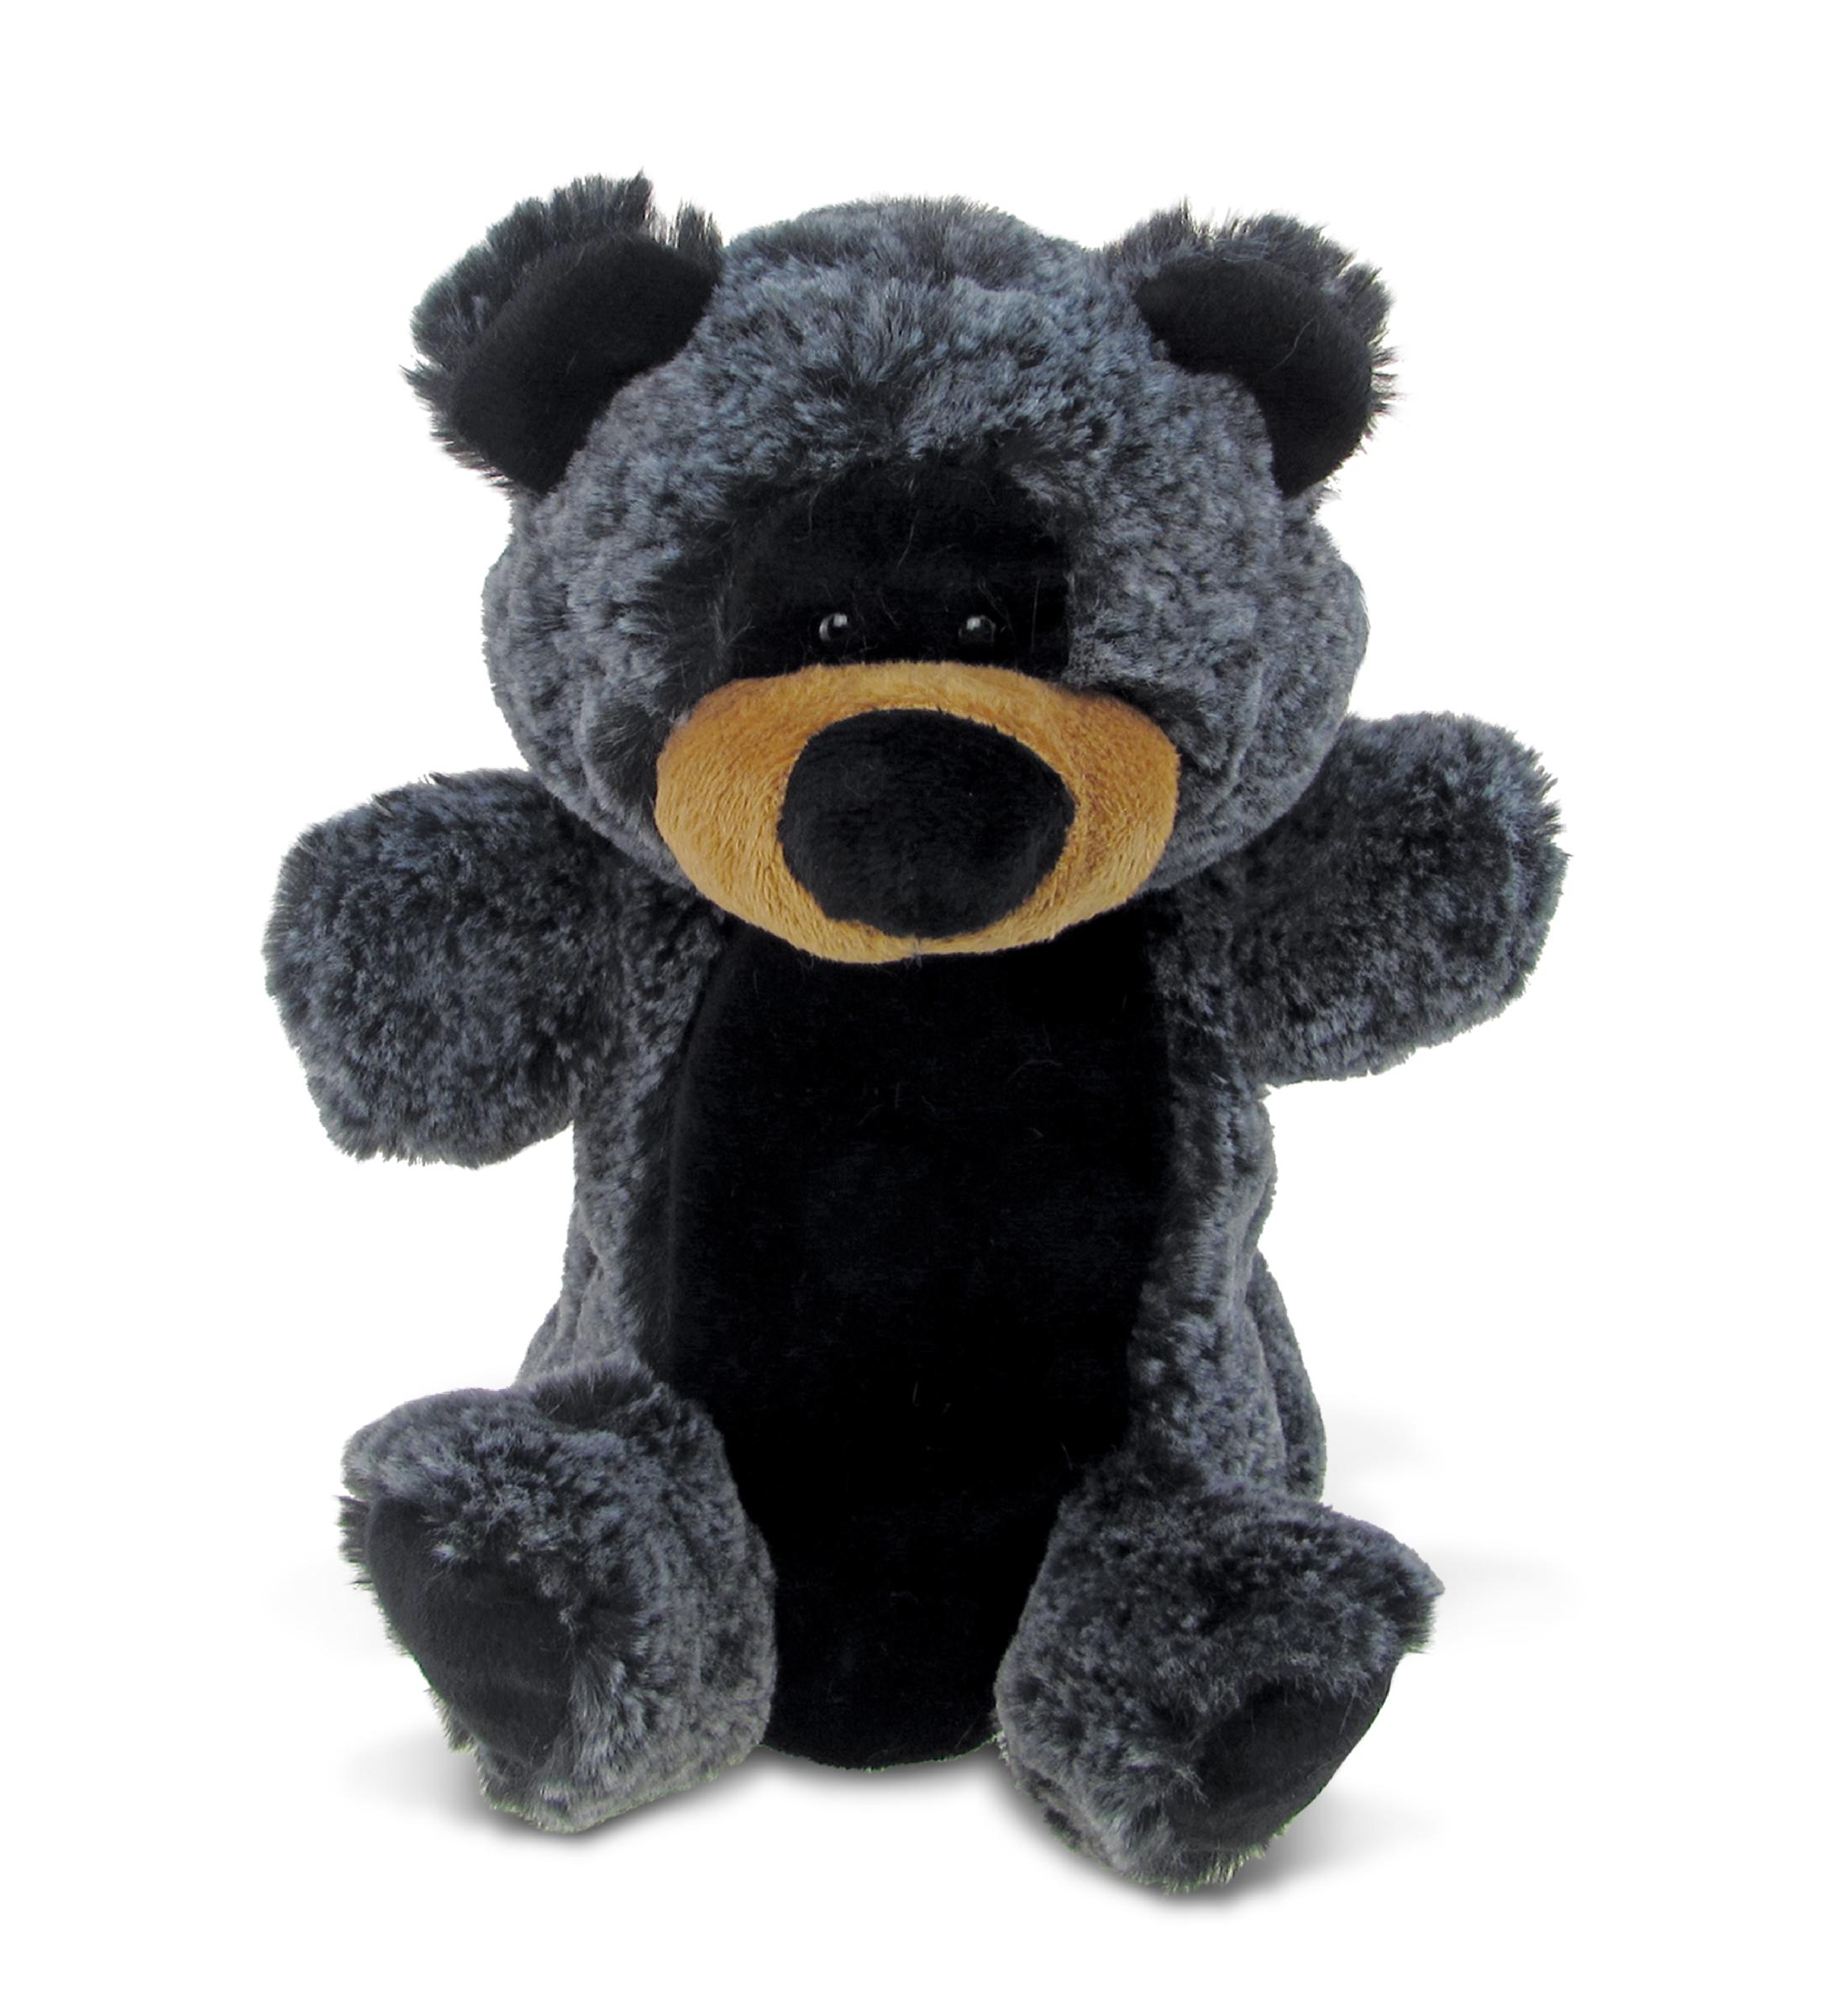 Puzzled Super Soft Plush Hand Puppet Black Bear